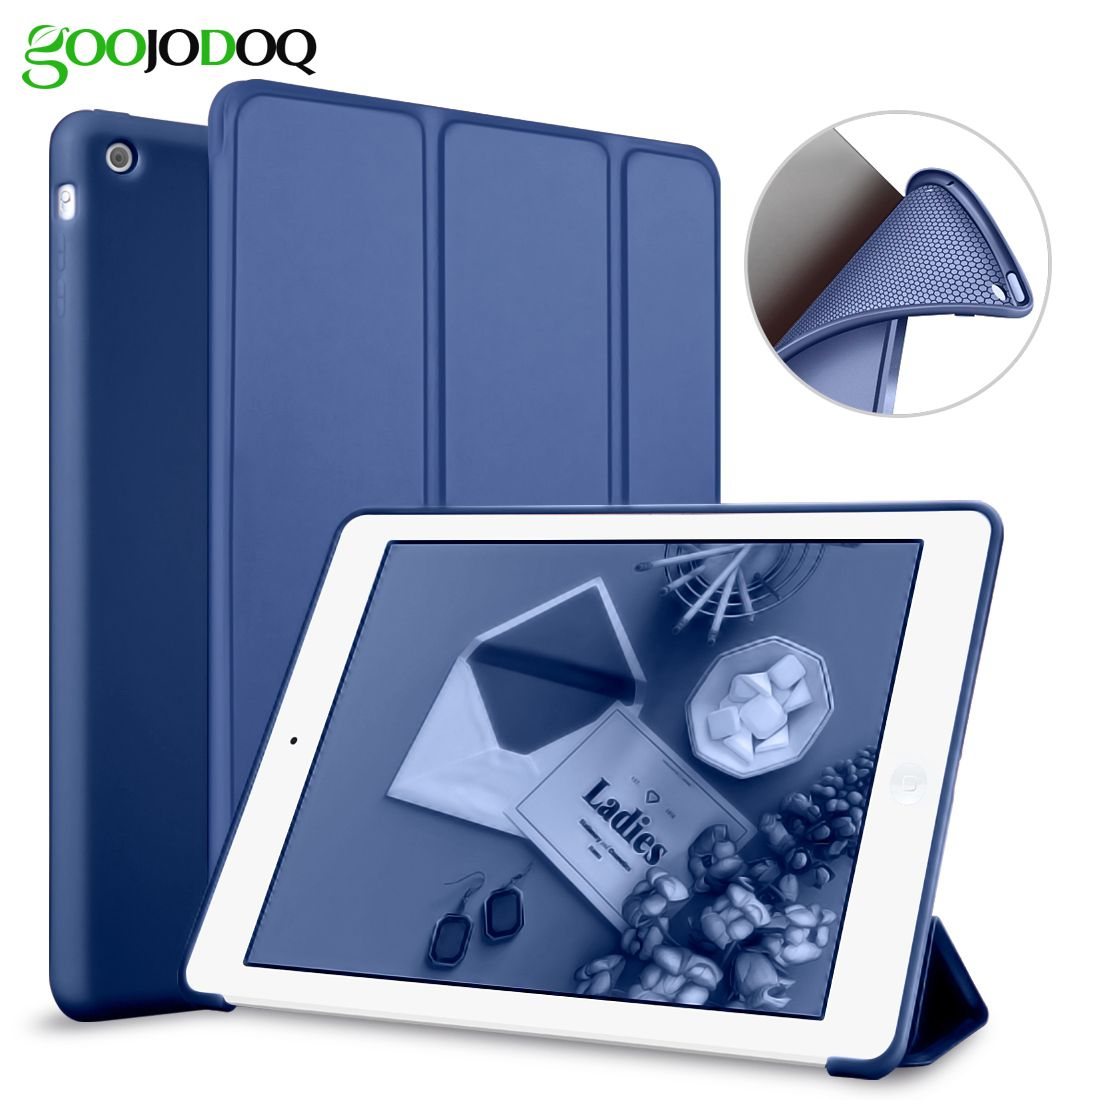 For Ipad Mini 2 4 3 1 Casepu Leathertpu Silicone Soft Back Smart Case Coque Stand Auto Sleep Wake For Ipad Mini 4 Cover 7 9 With Images Ipad Mini New Ipad Ipad